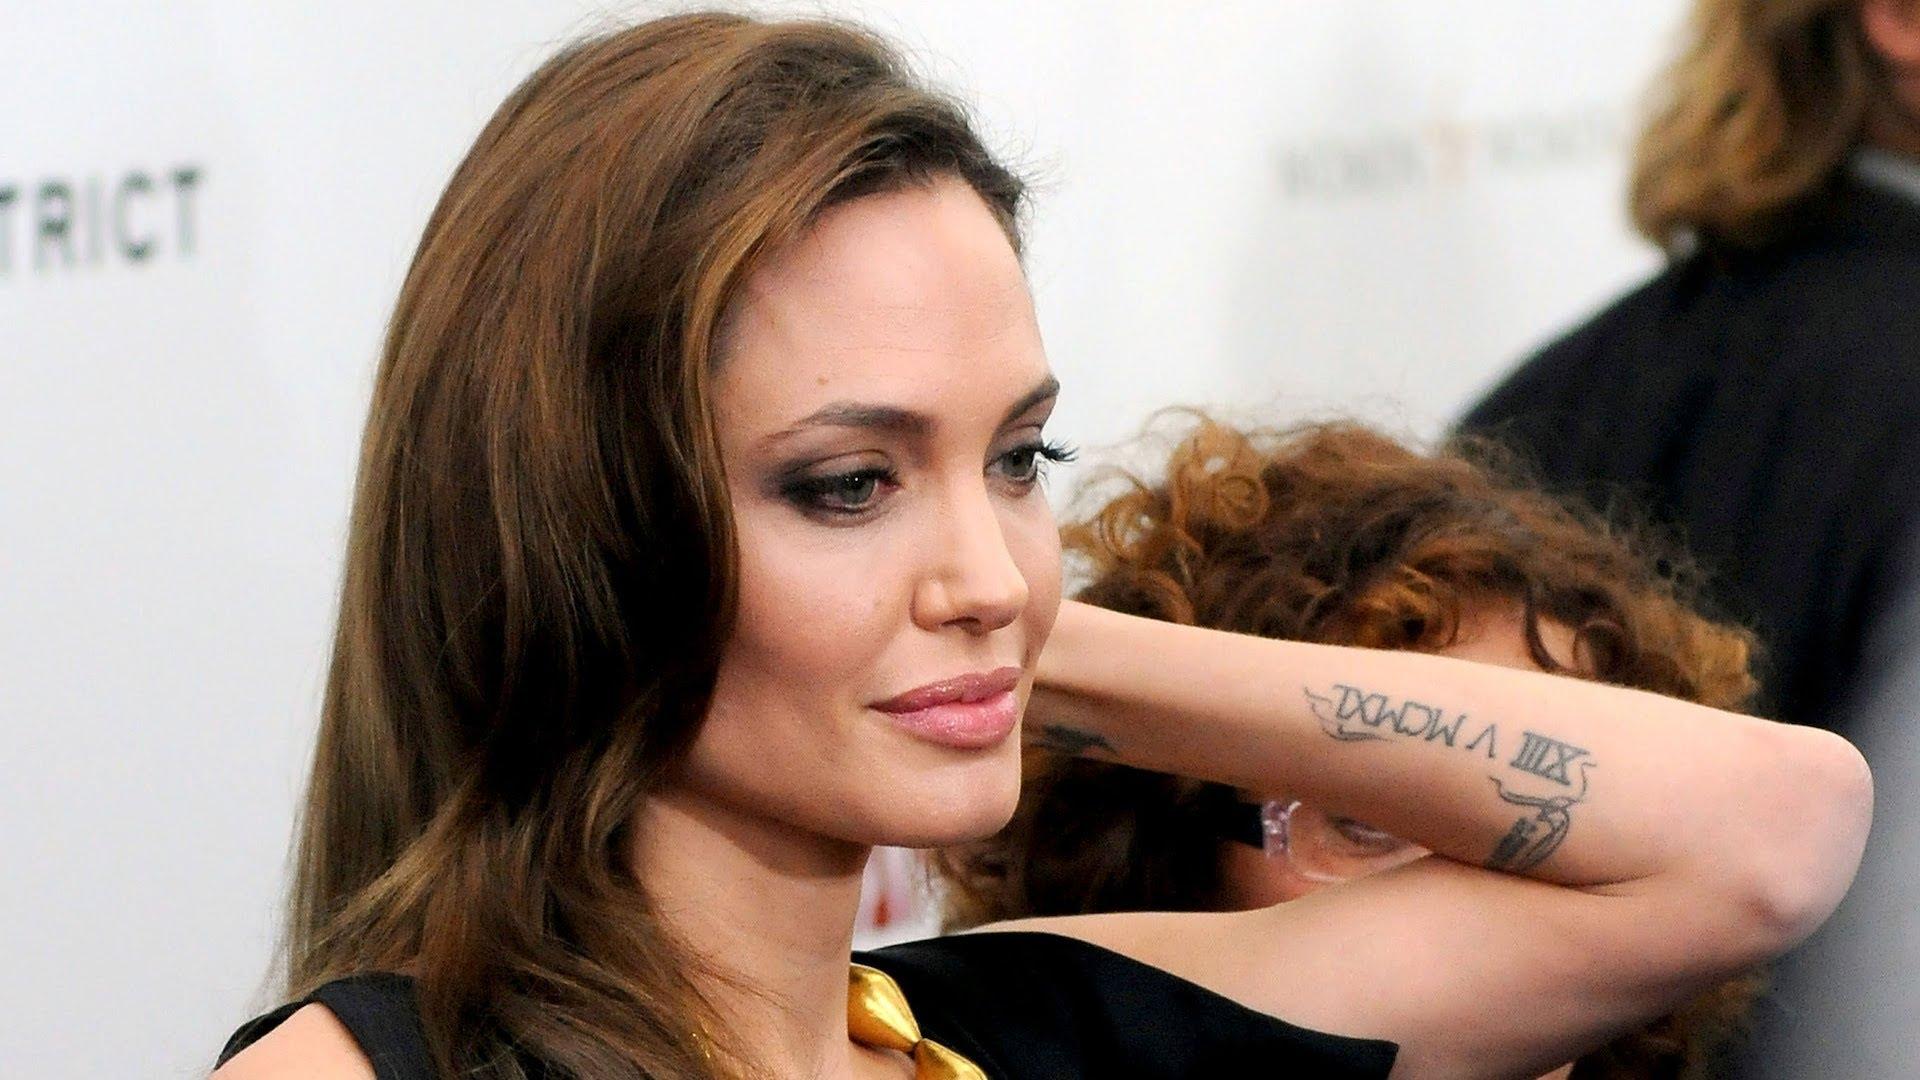 angelina-jolie-tattoo Angelina Jolie